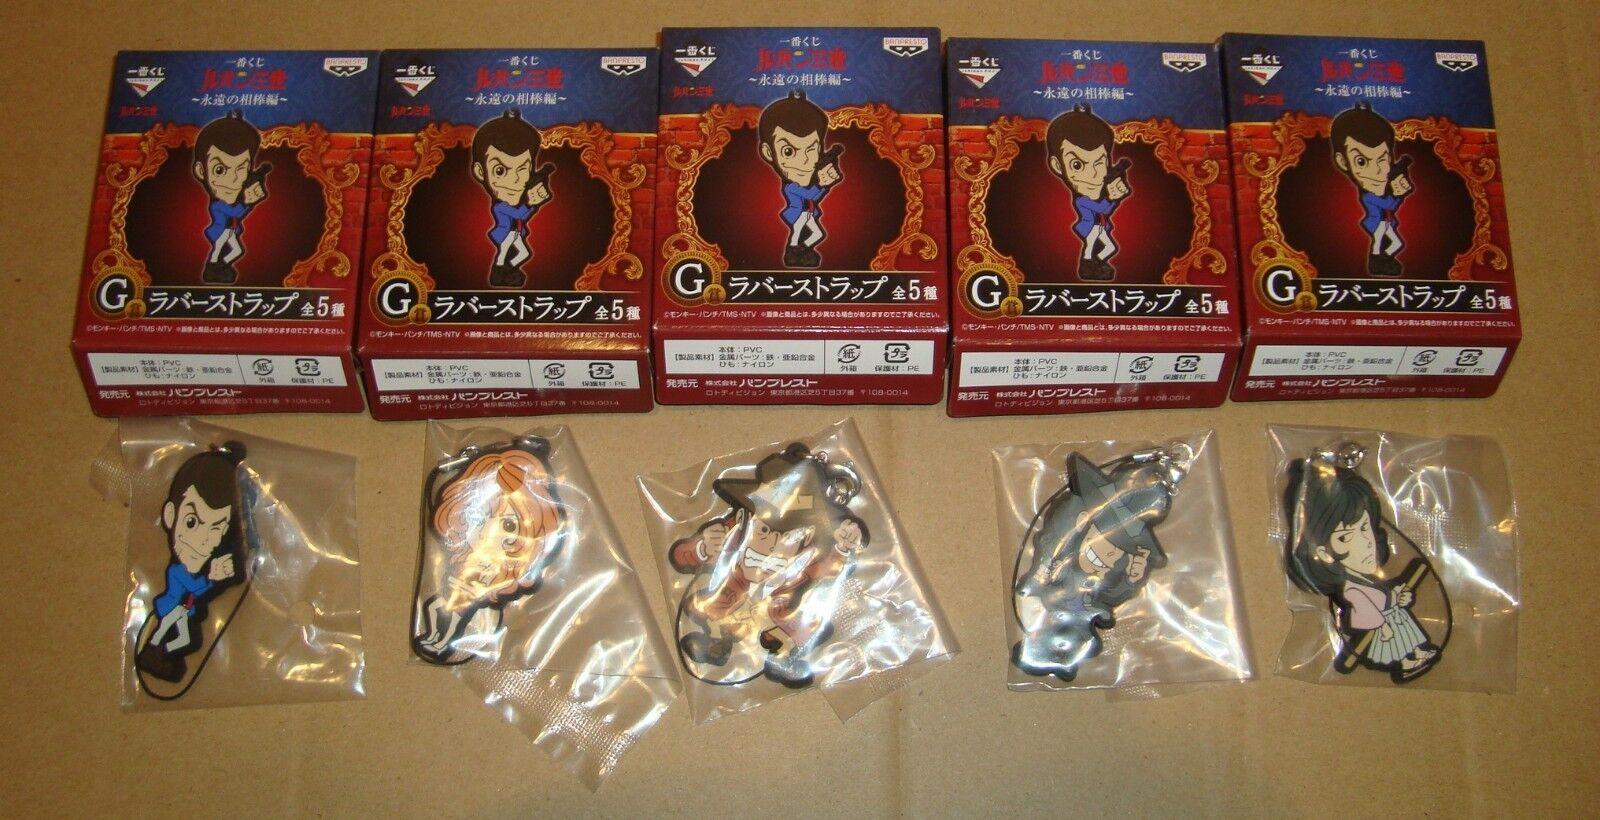 LUPIN THE THIRD RUBBER CELL STRAP SET LUPIN III/FUJIKO/ZENIGATA/GOEMON/JIGEN